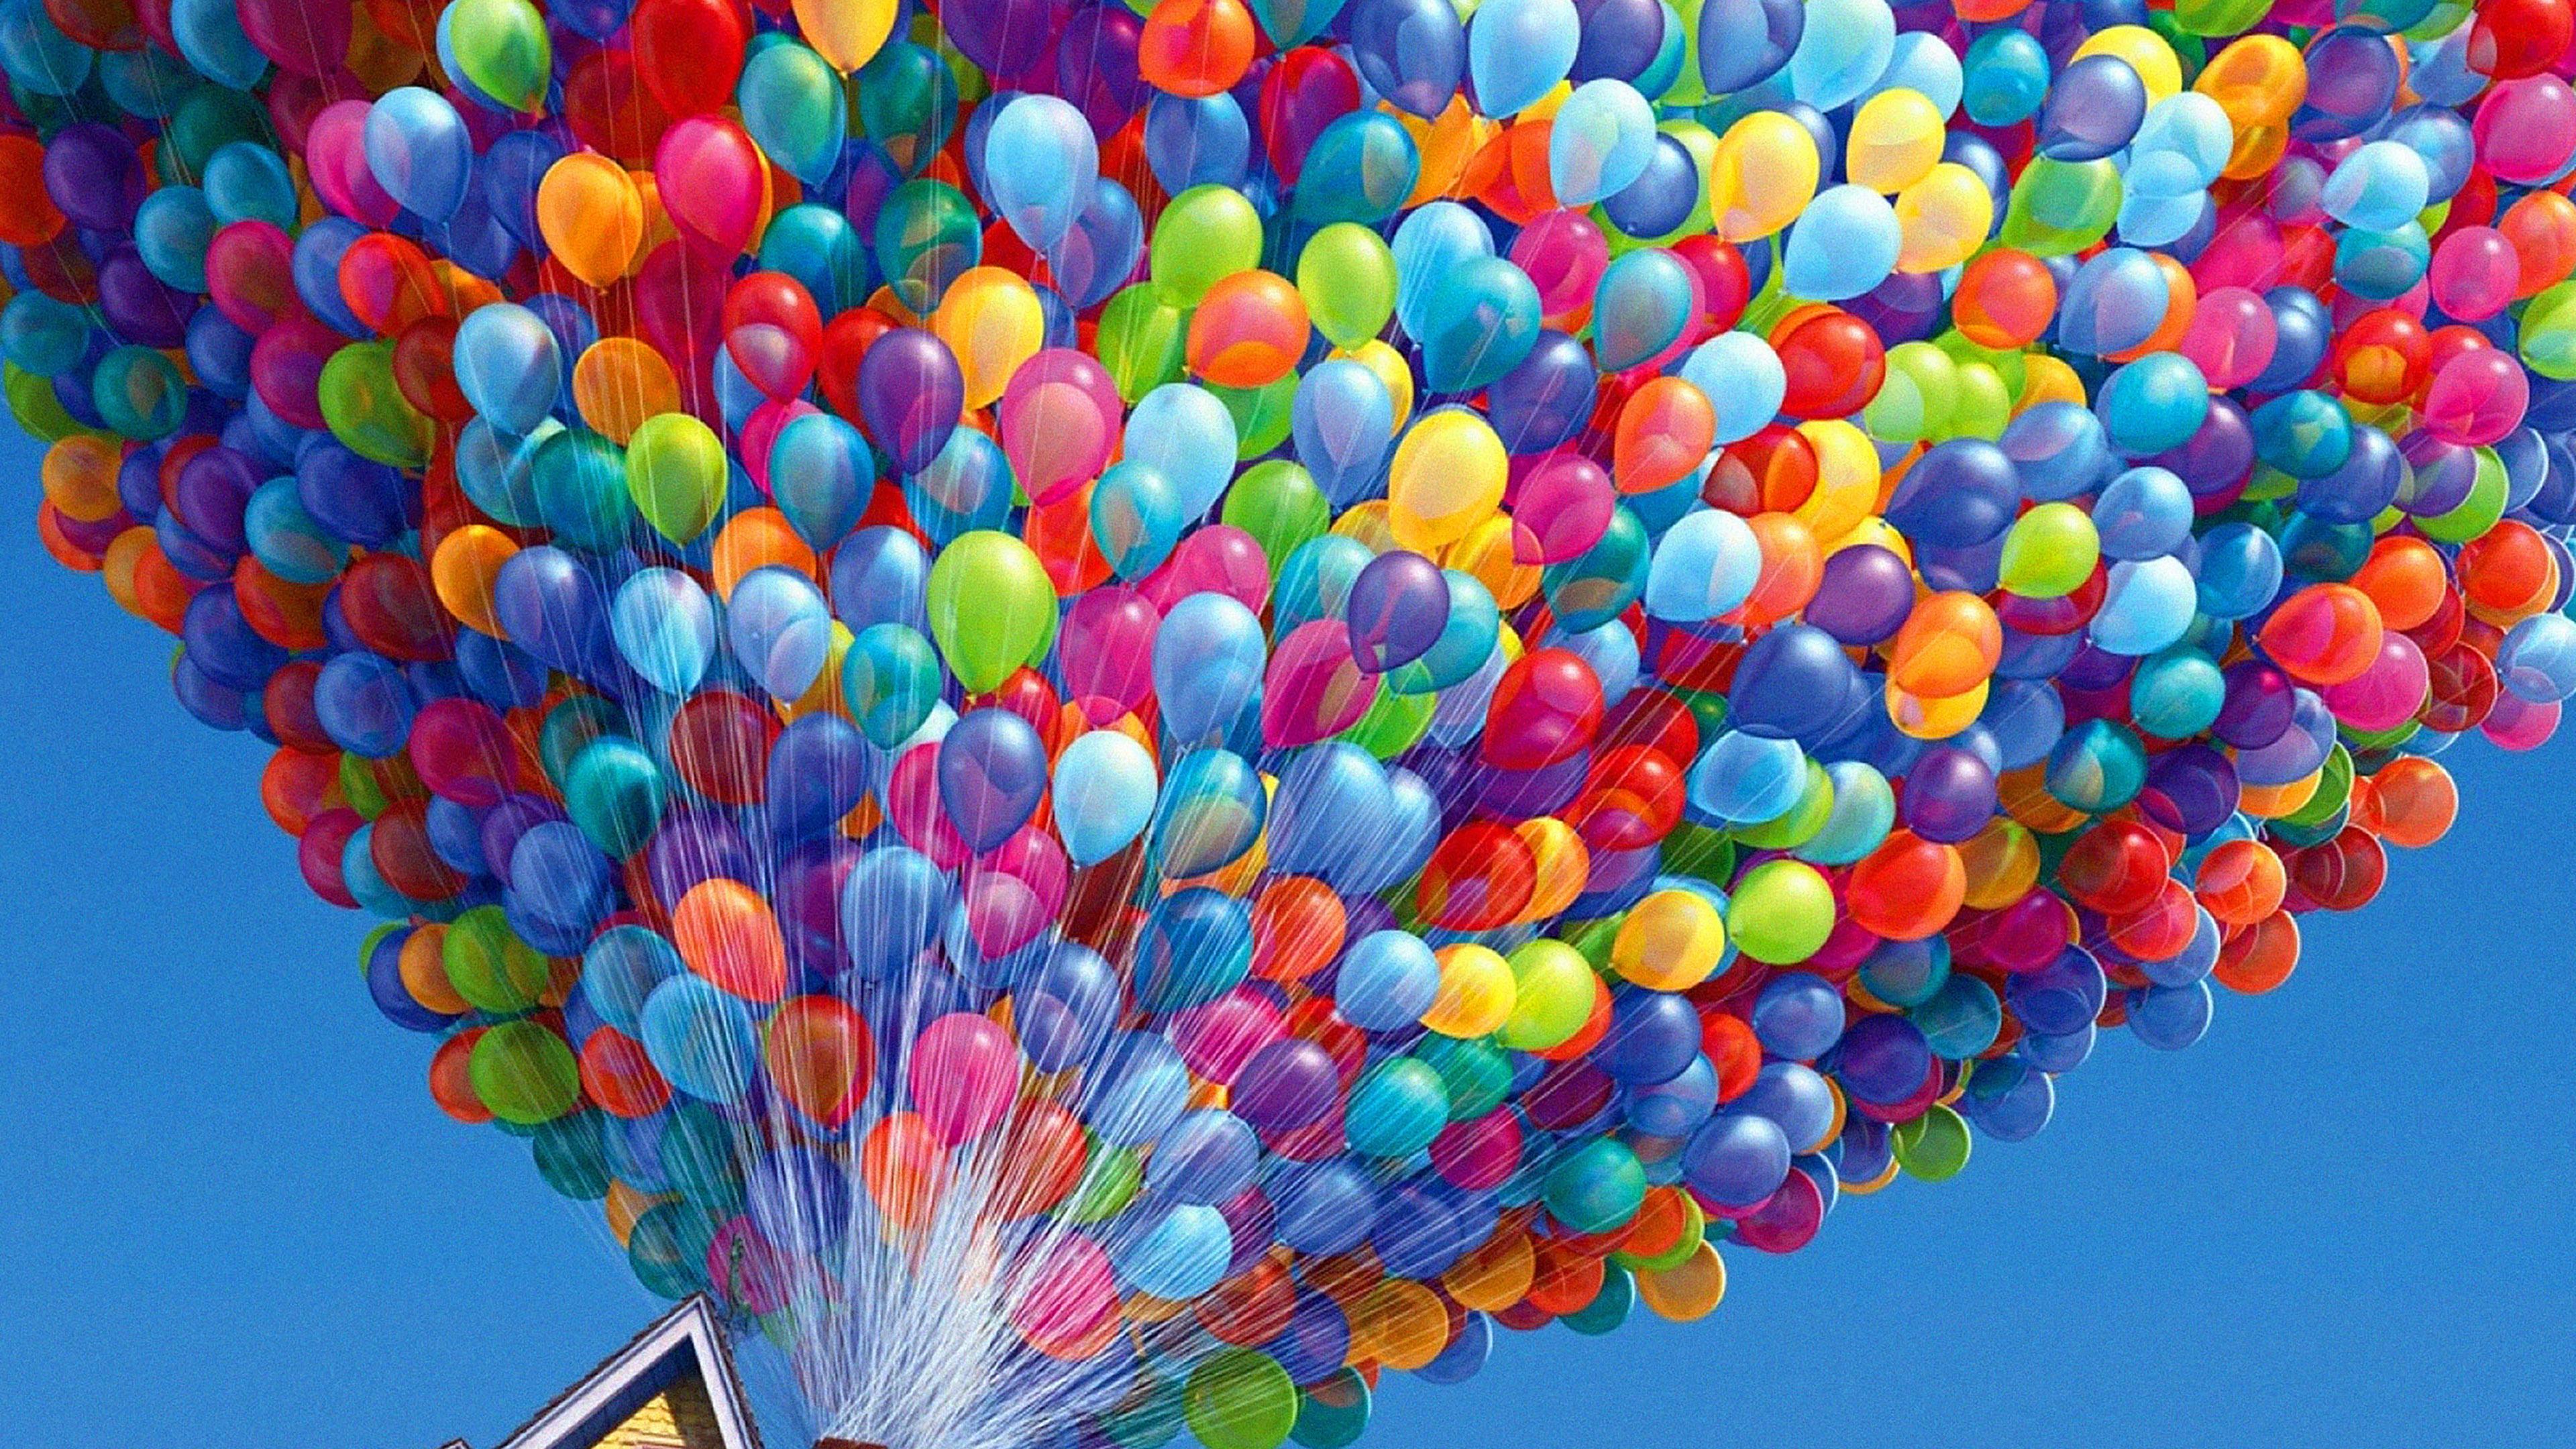 co aa28 up balloons disney illust art 35 3840x2160 4k wallpaperjpg 3840x2160